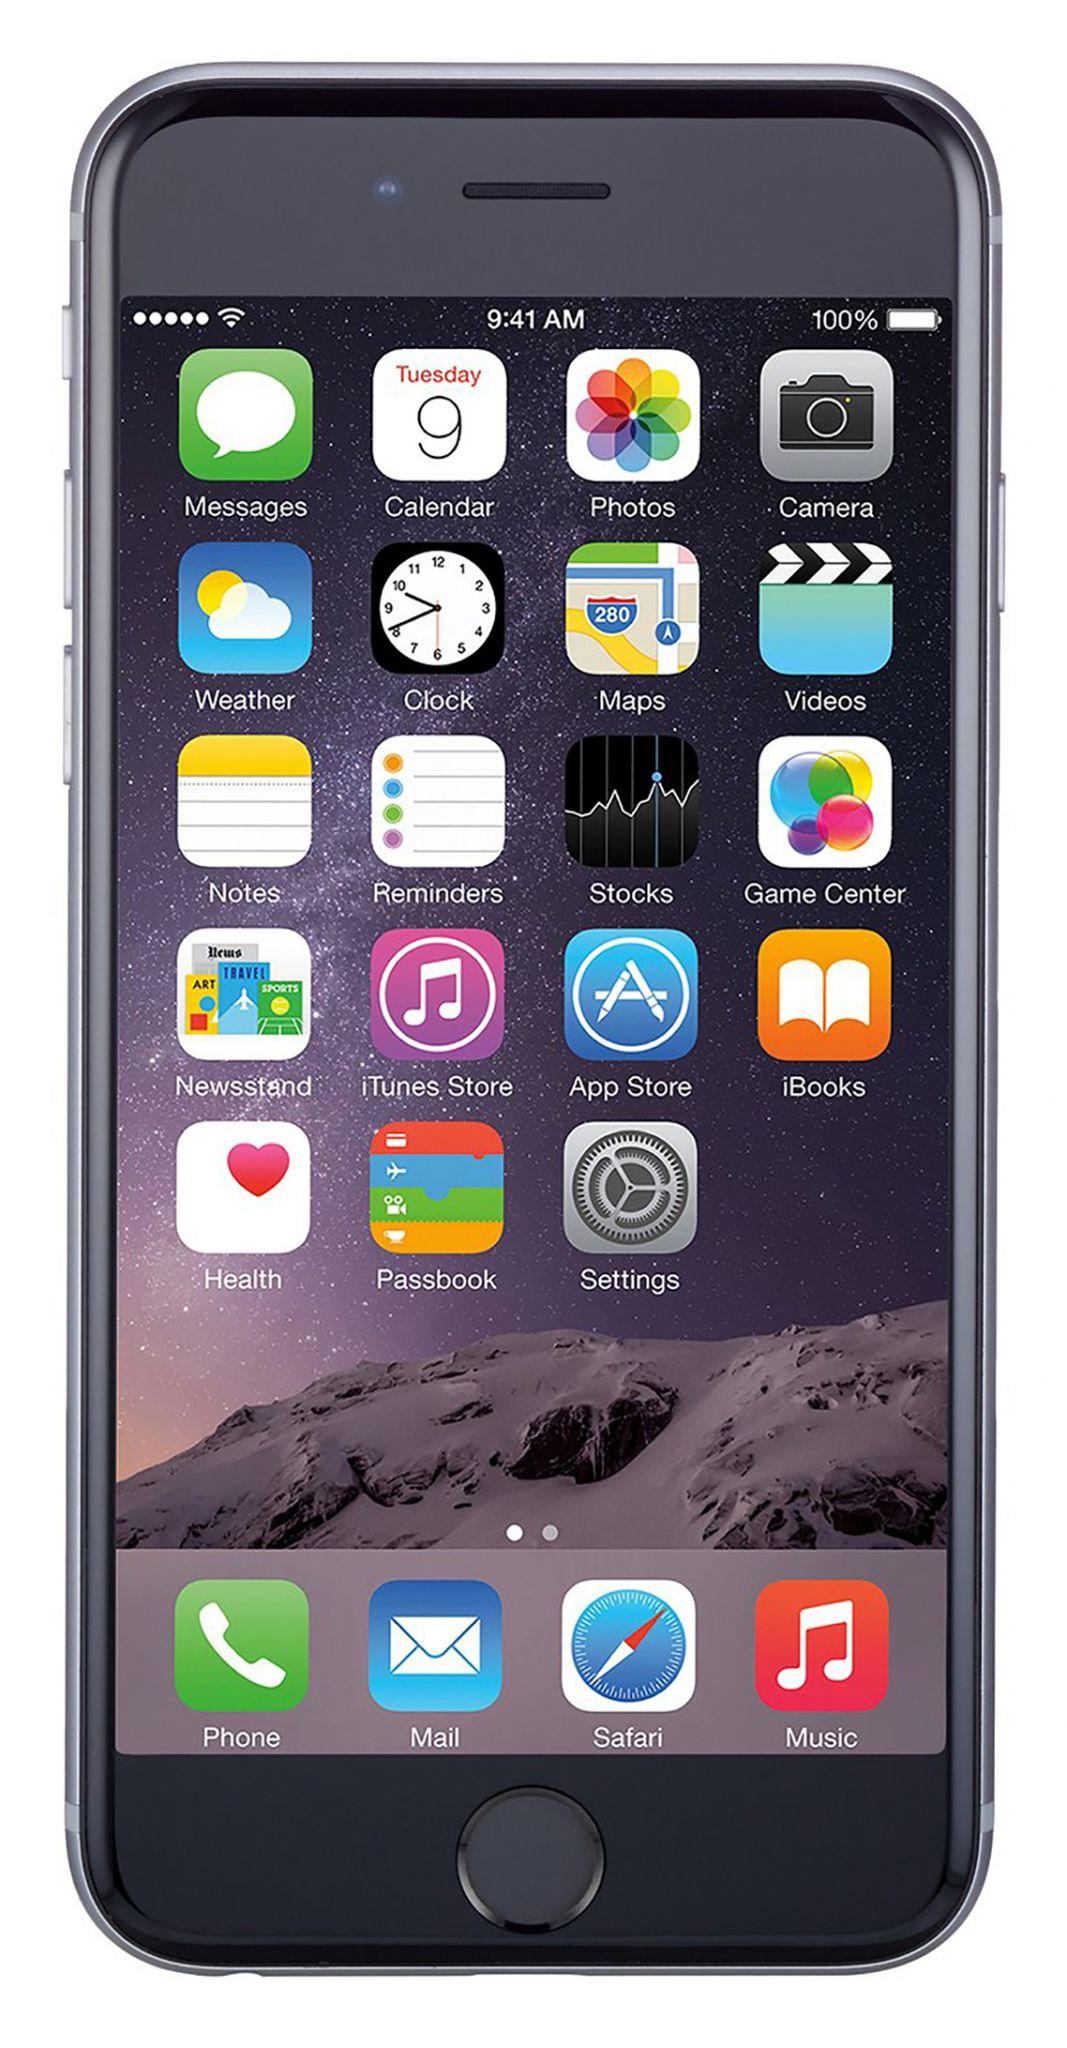 Apple iPhone 6 64GB Unlocked GSM Phone w/ 8MP Camera - Space Gray(Refurbished) - Walmart.com